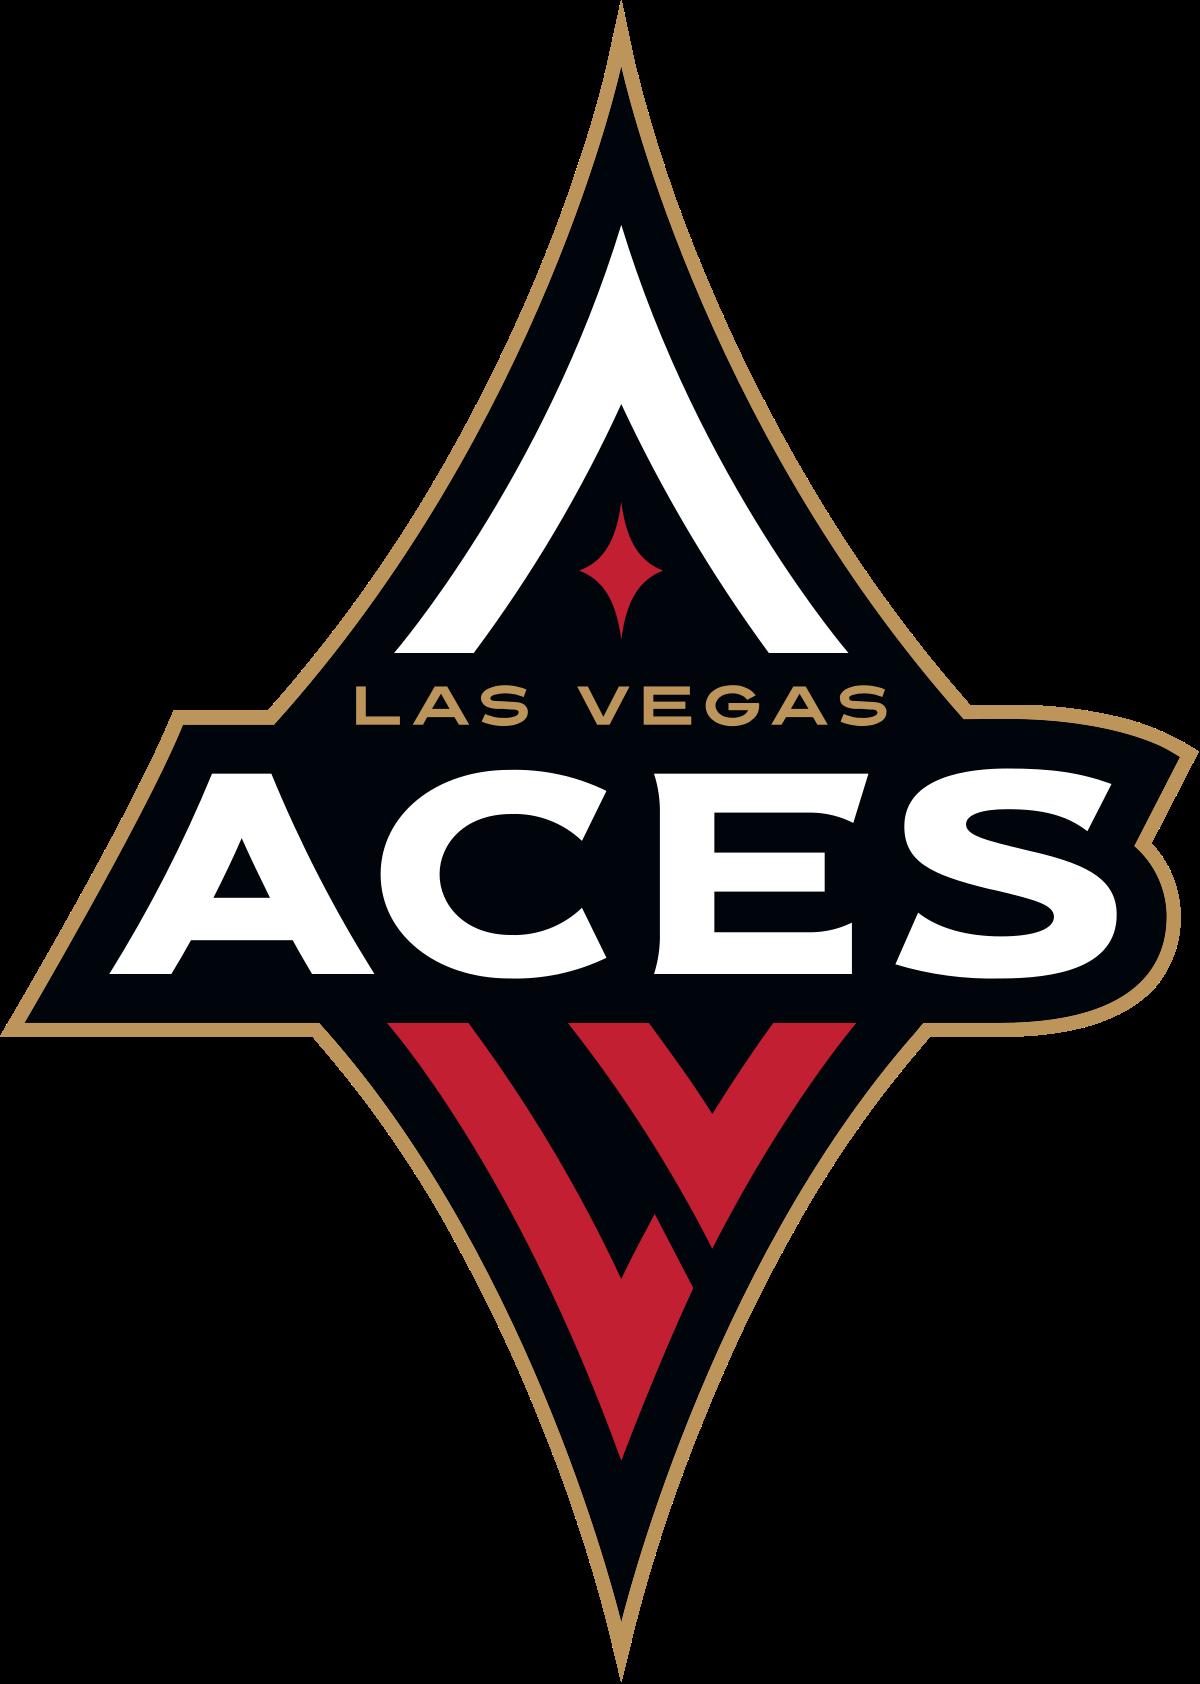 Las Vegas Aces Logo inspiration, Sports logo